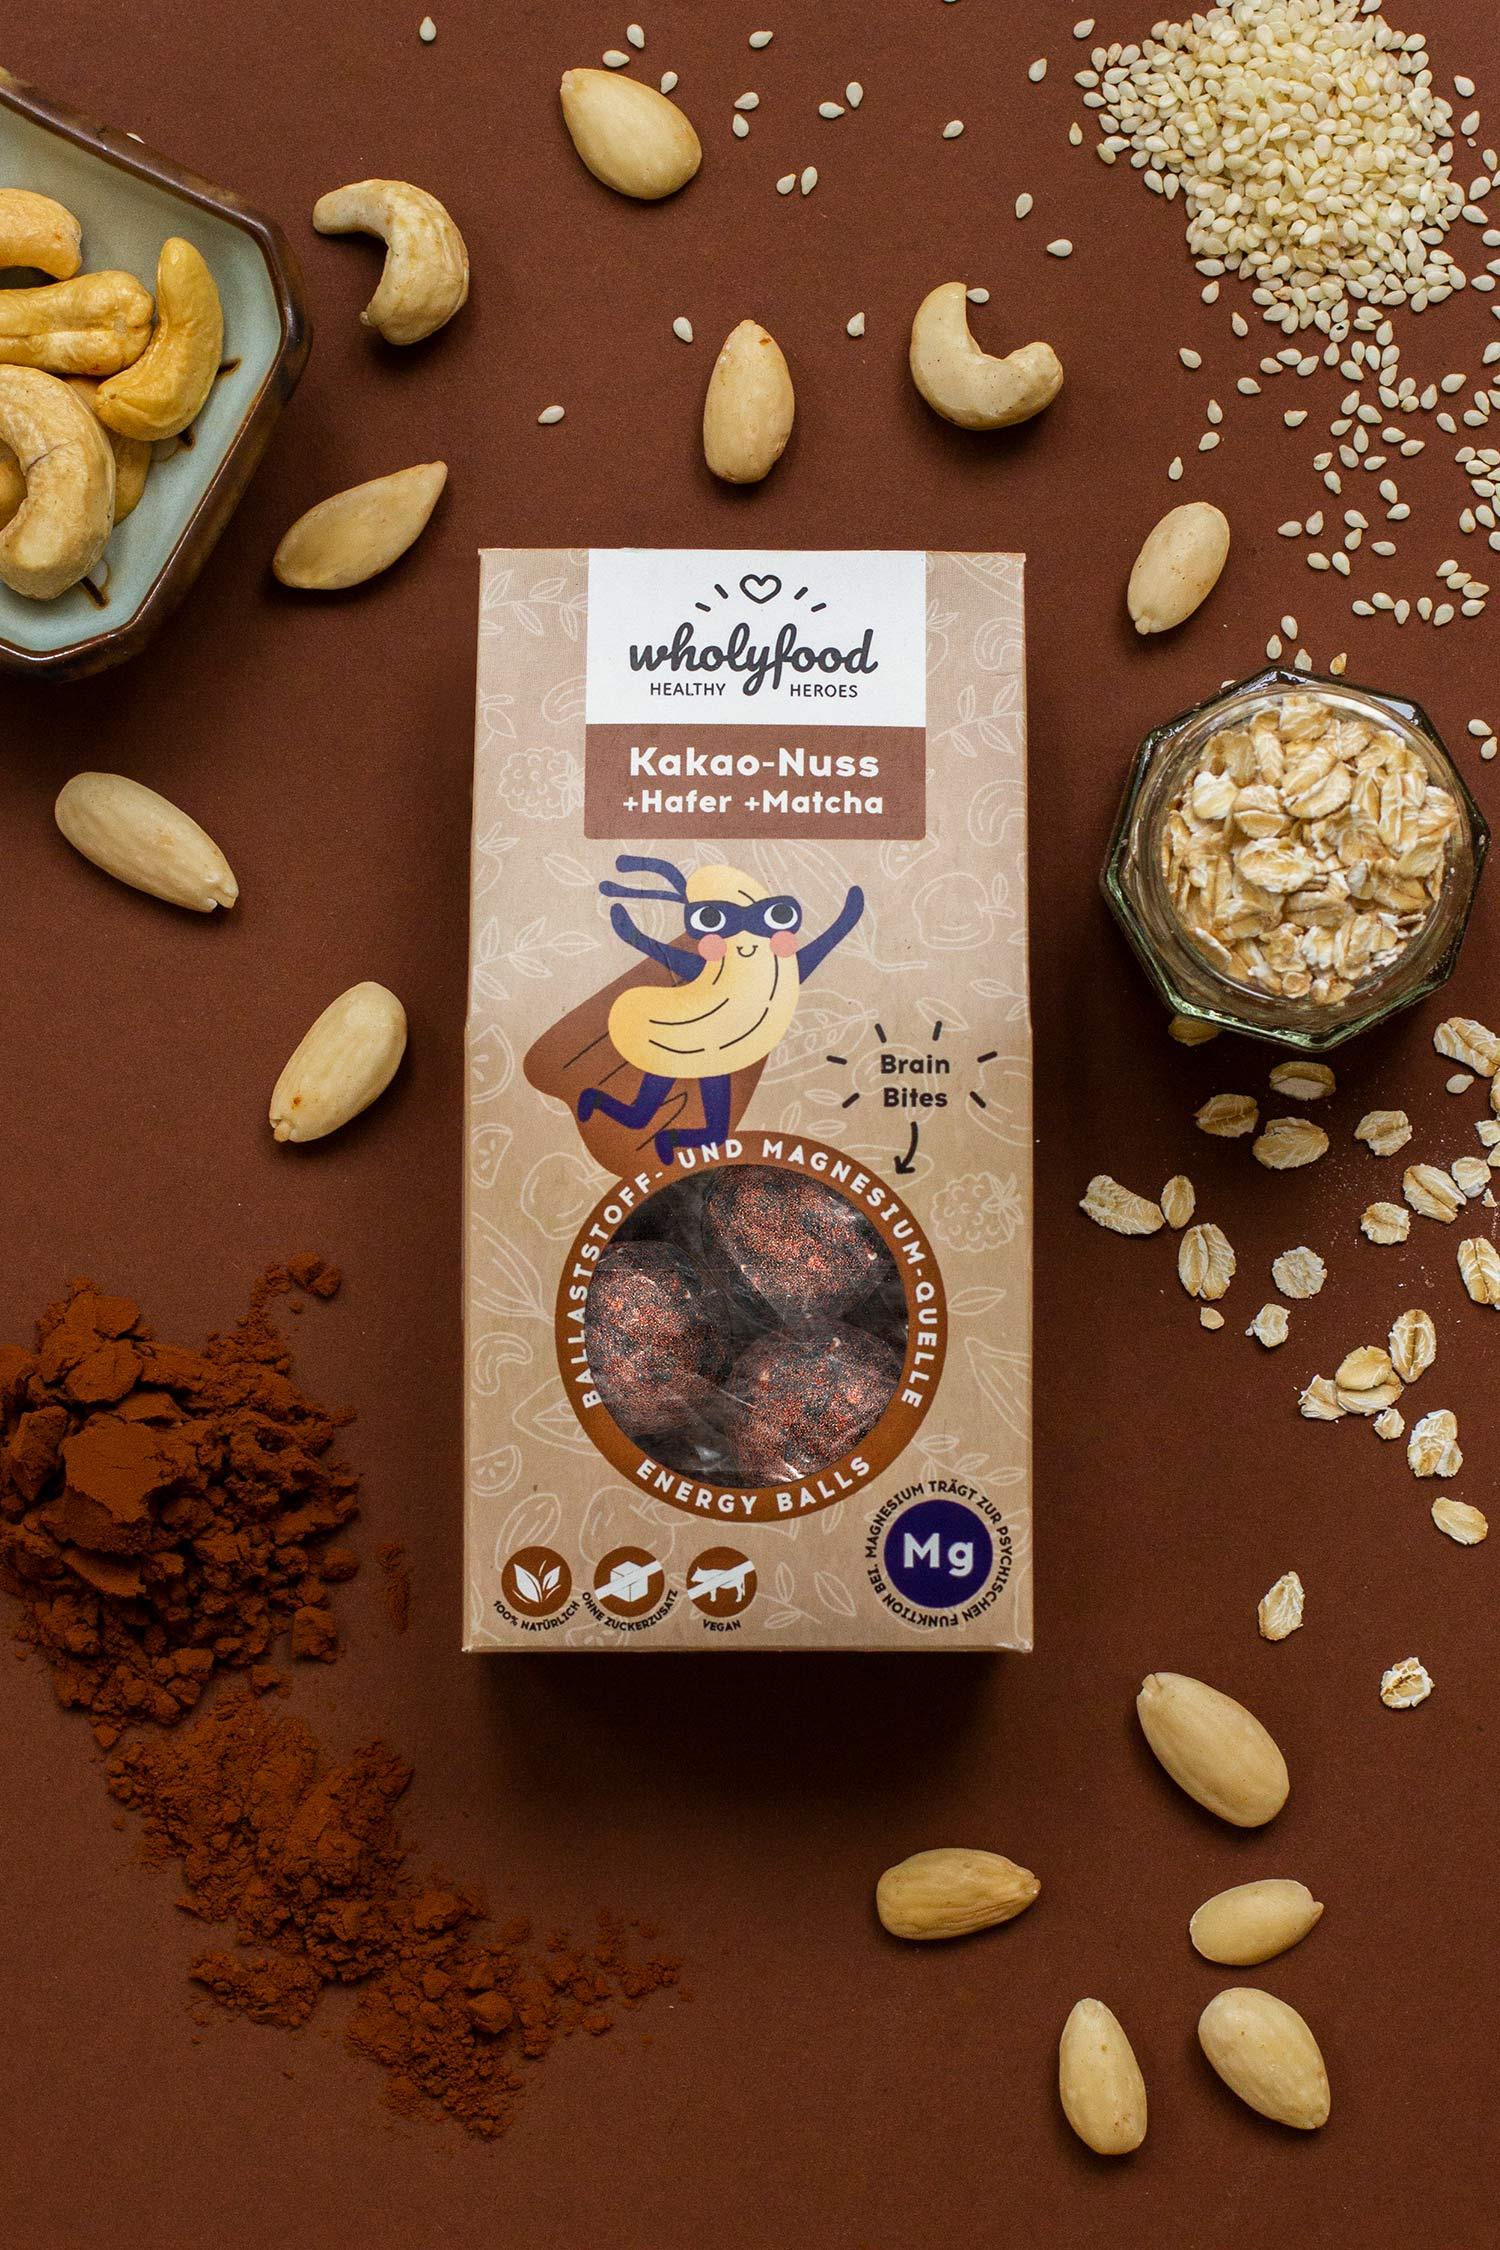 wholyfood_packaging_ingredients_Kakao